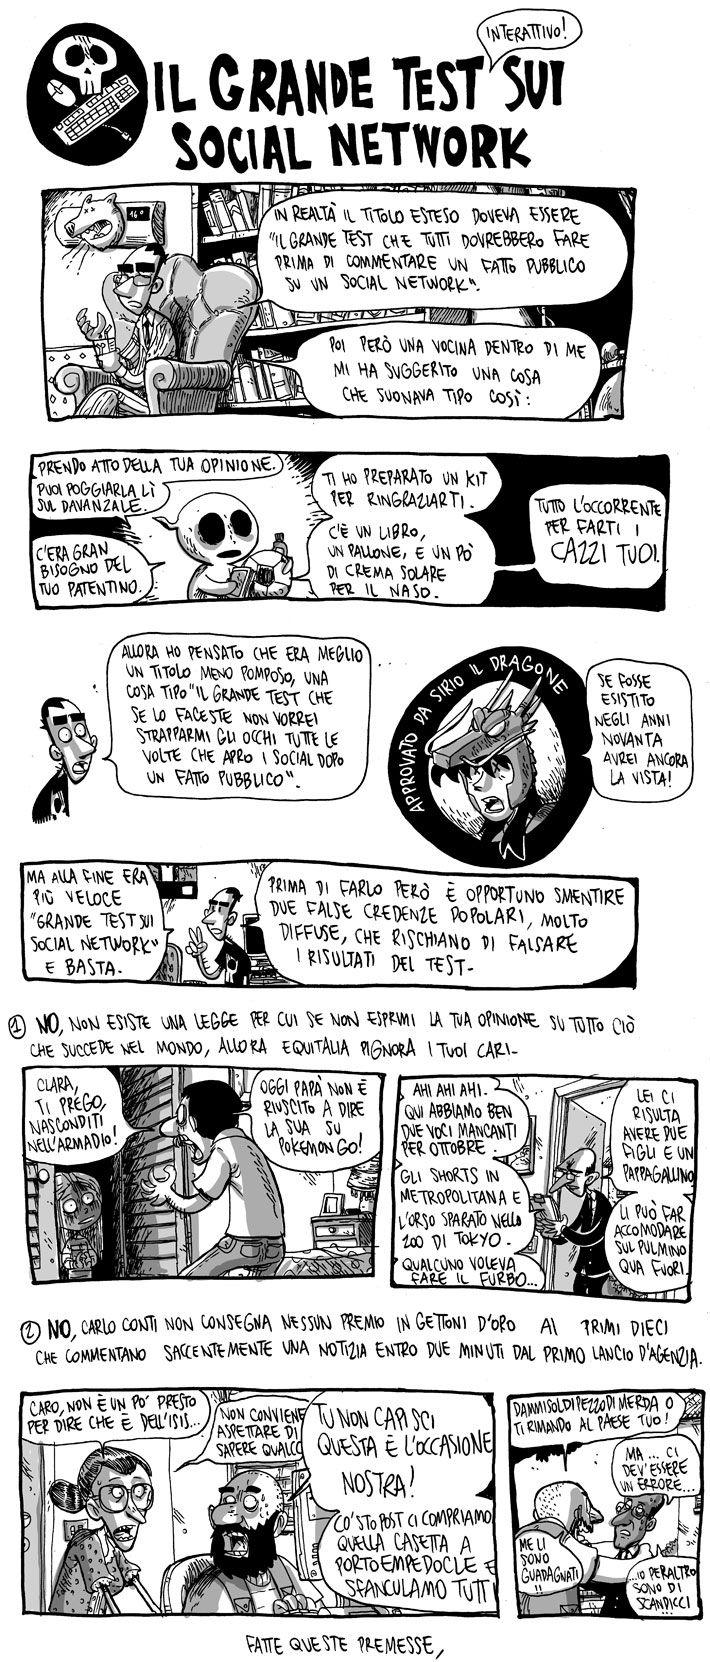 Alan ford gruppo t n t ubc enciclopedia online del fumetto - Zero